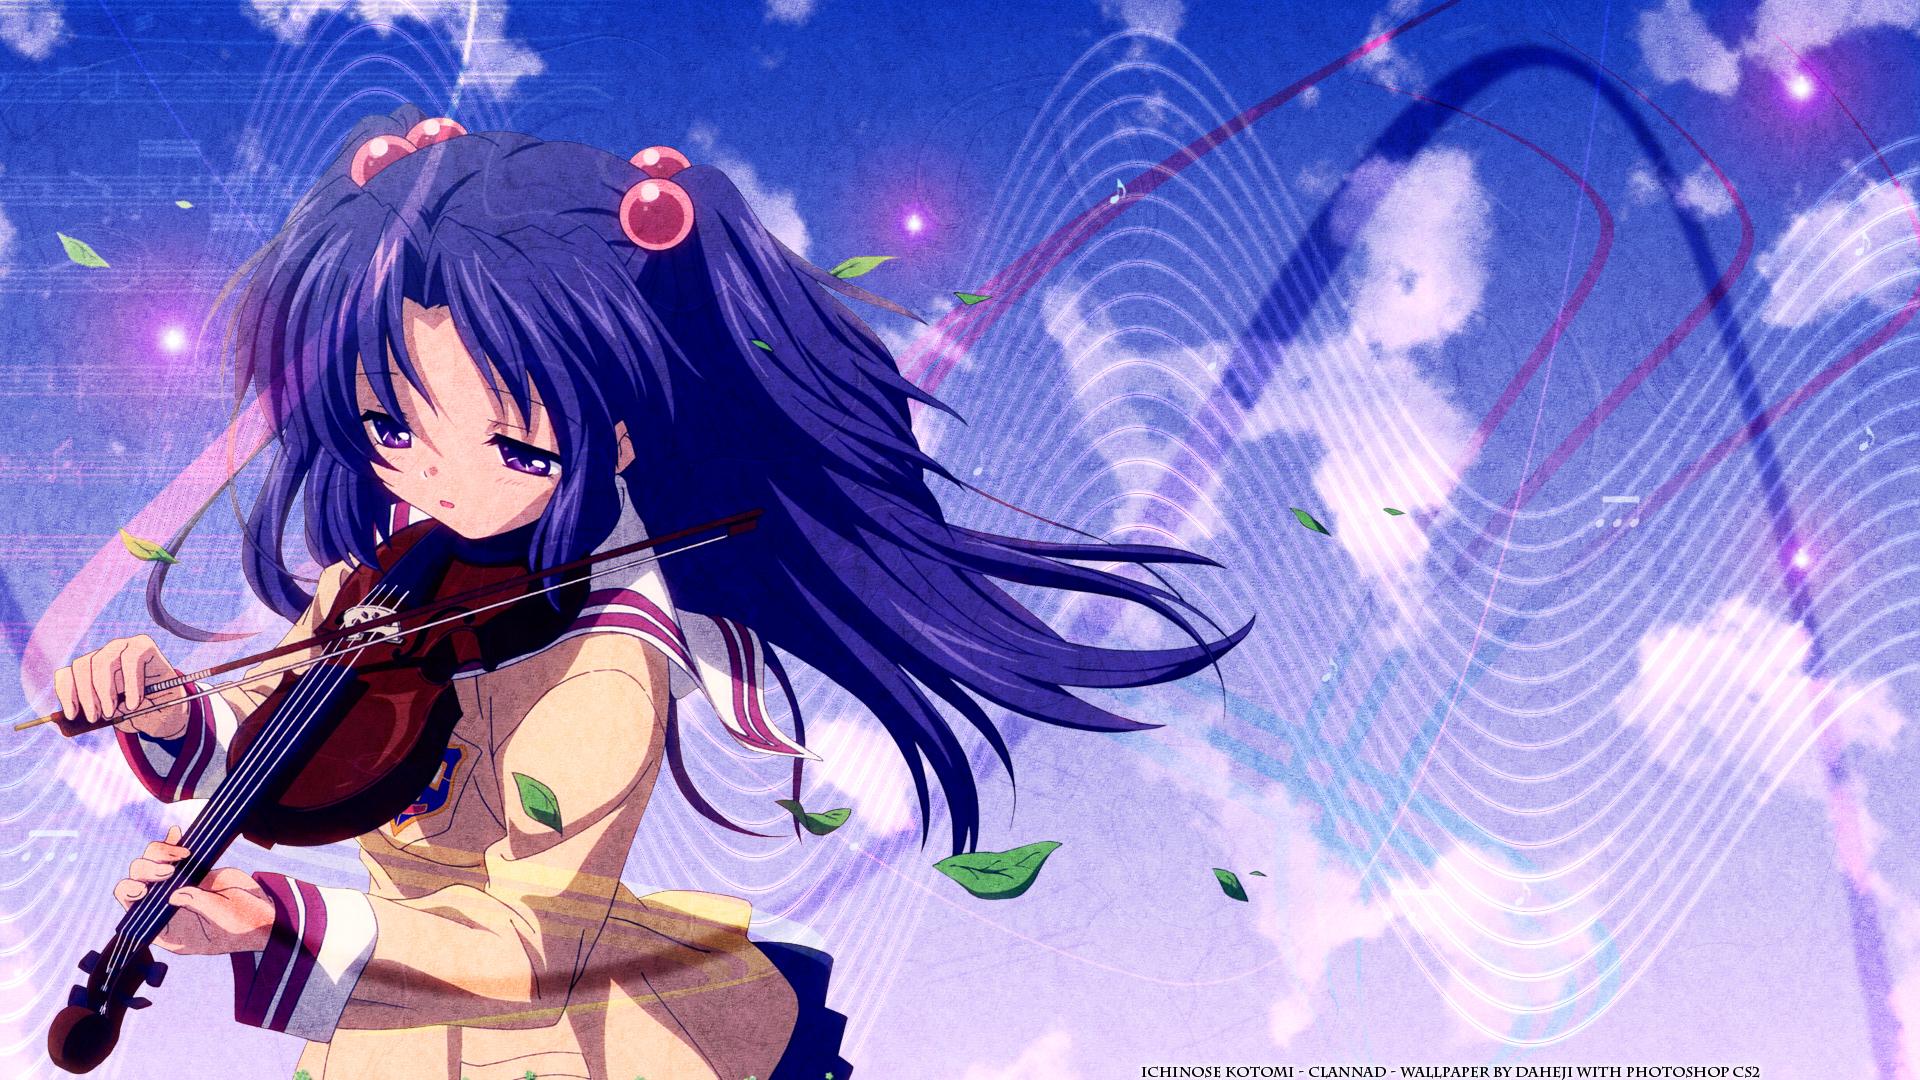 Sad Alone Girl Hd Wallpaper Download Clannad Girls Images Kotomi Ichinose Hd Wallpaper And